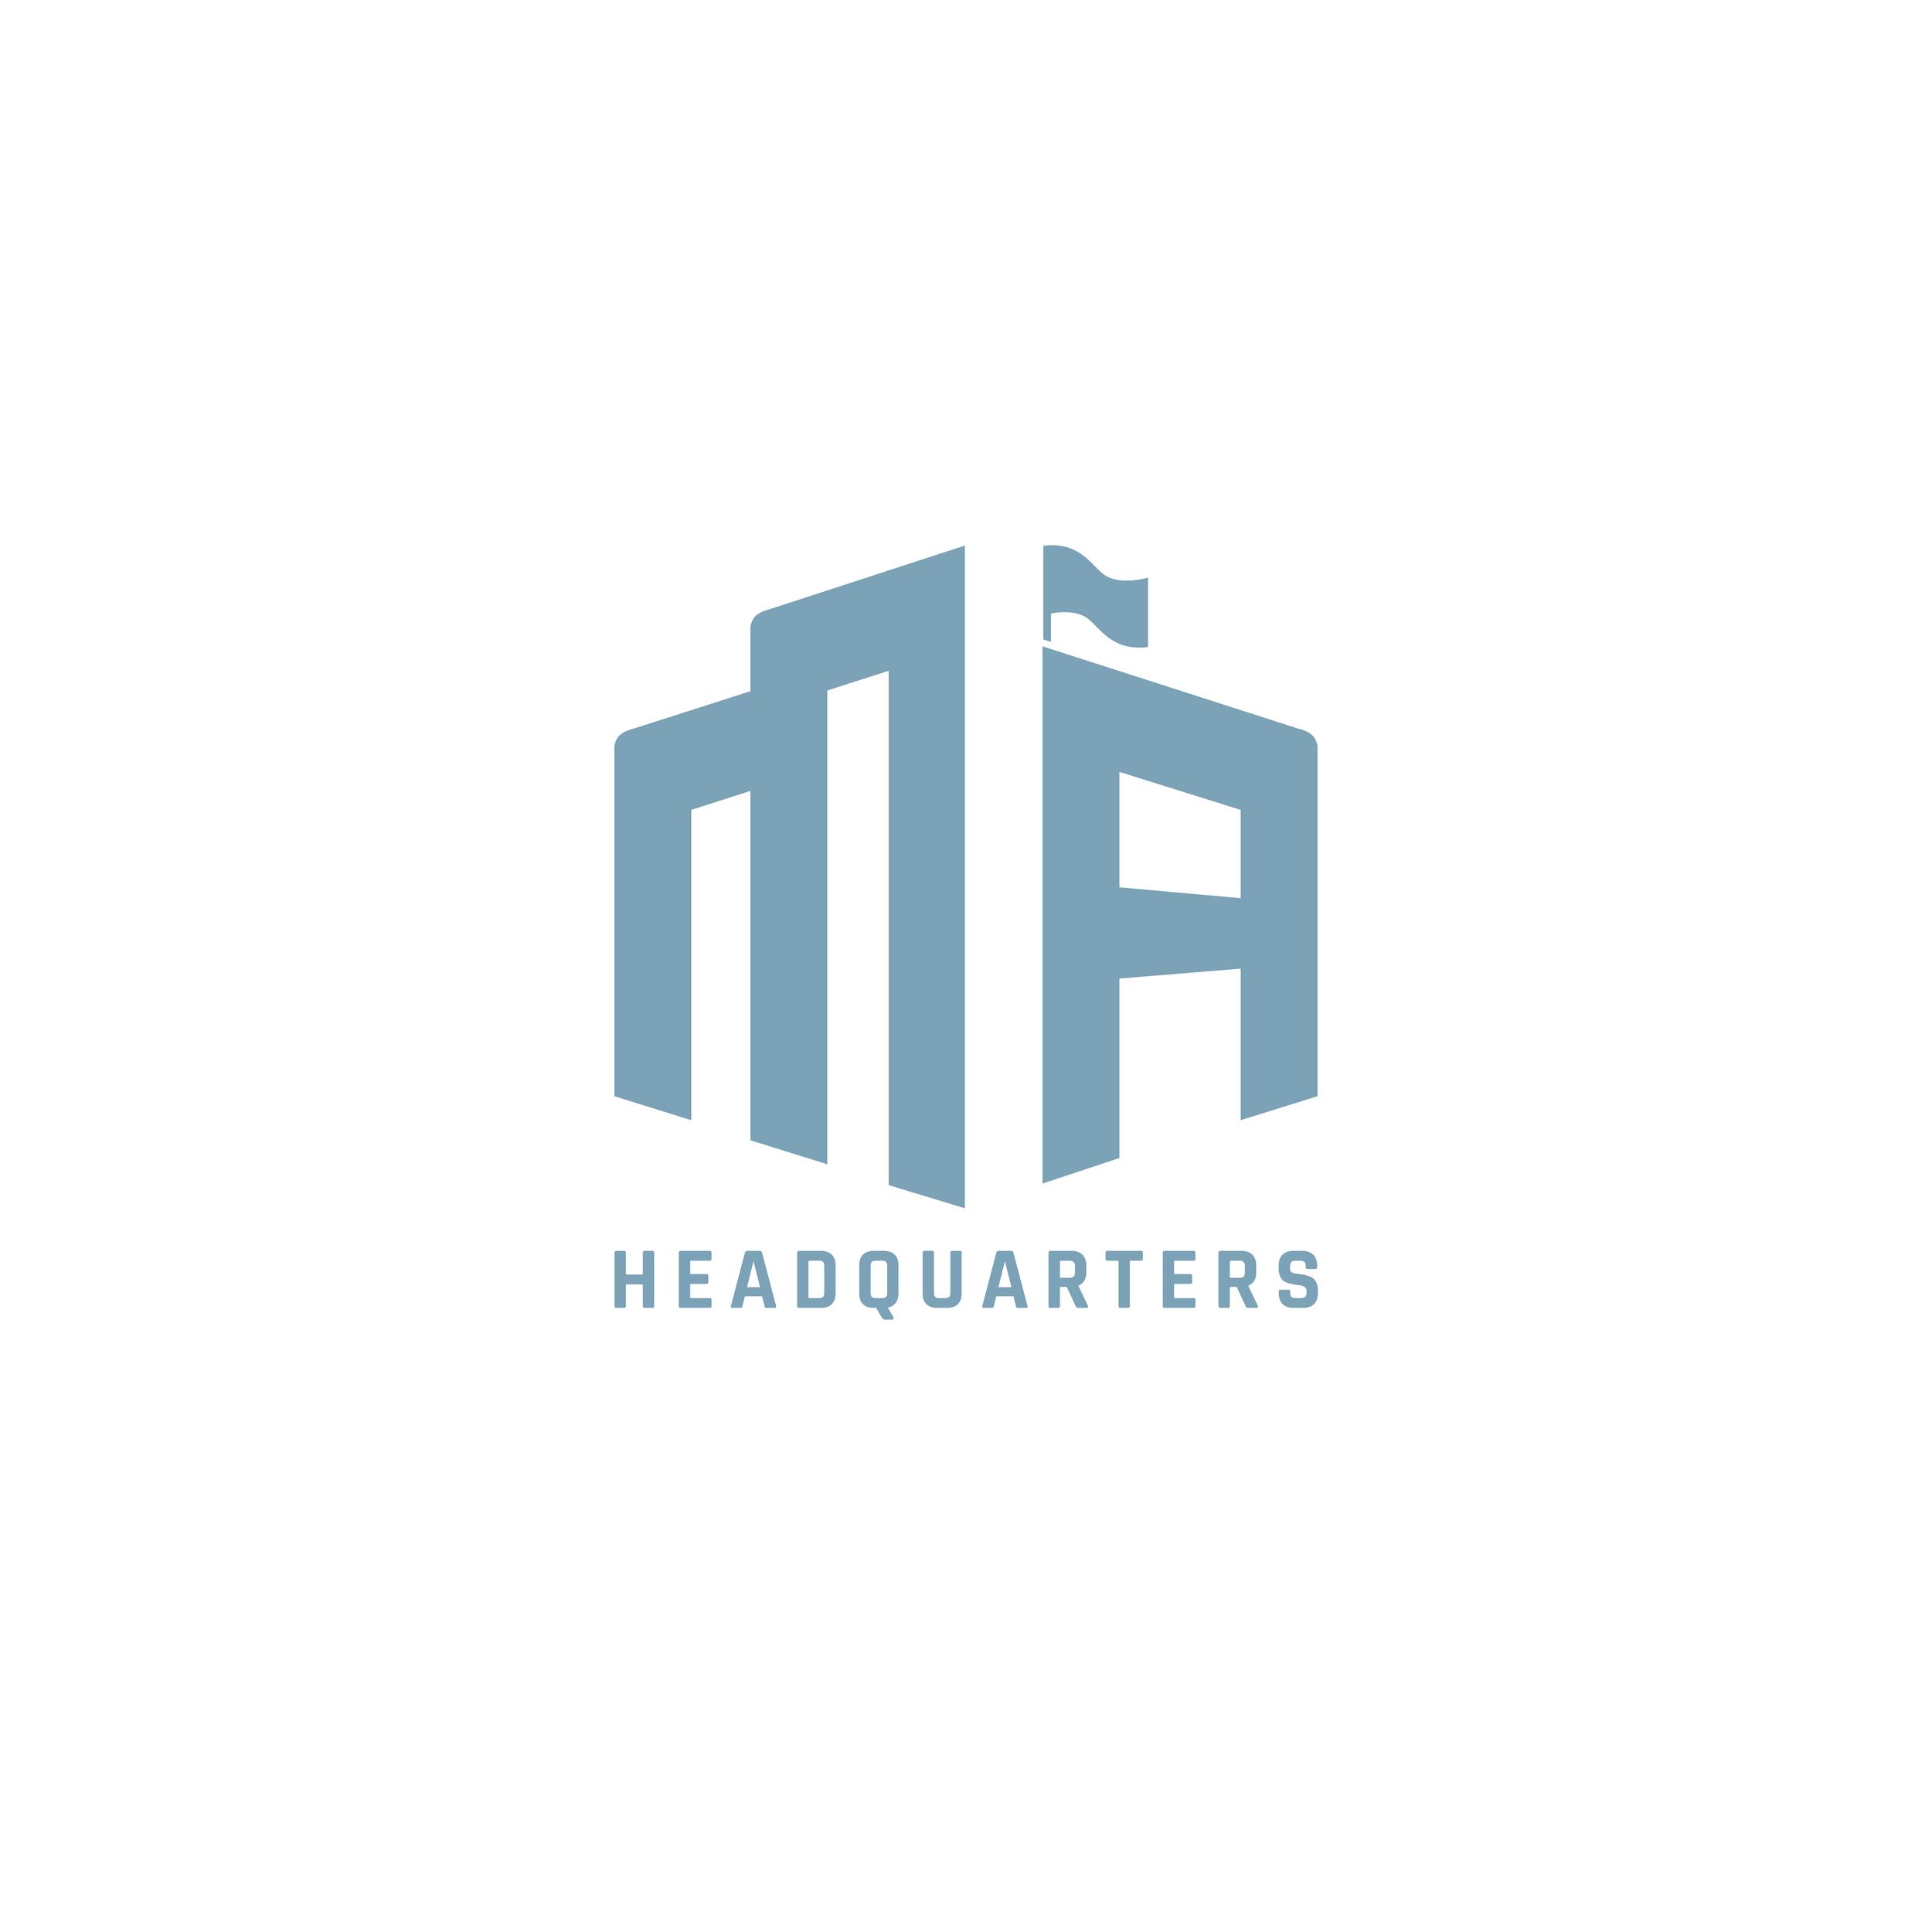 Midair Headquarters